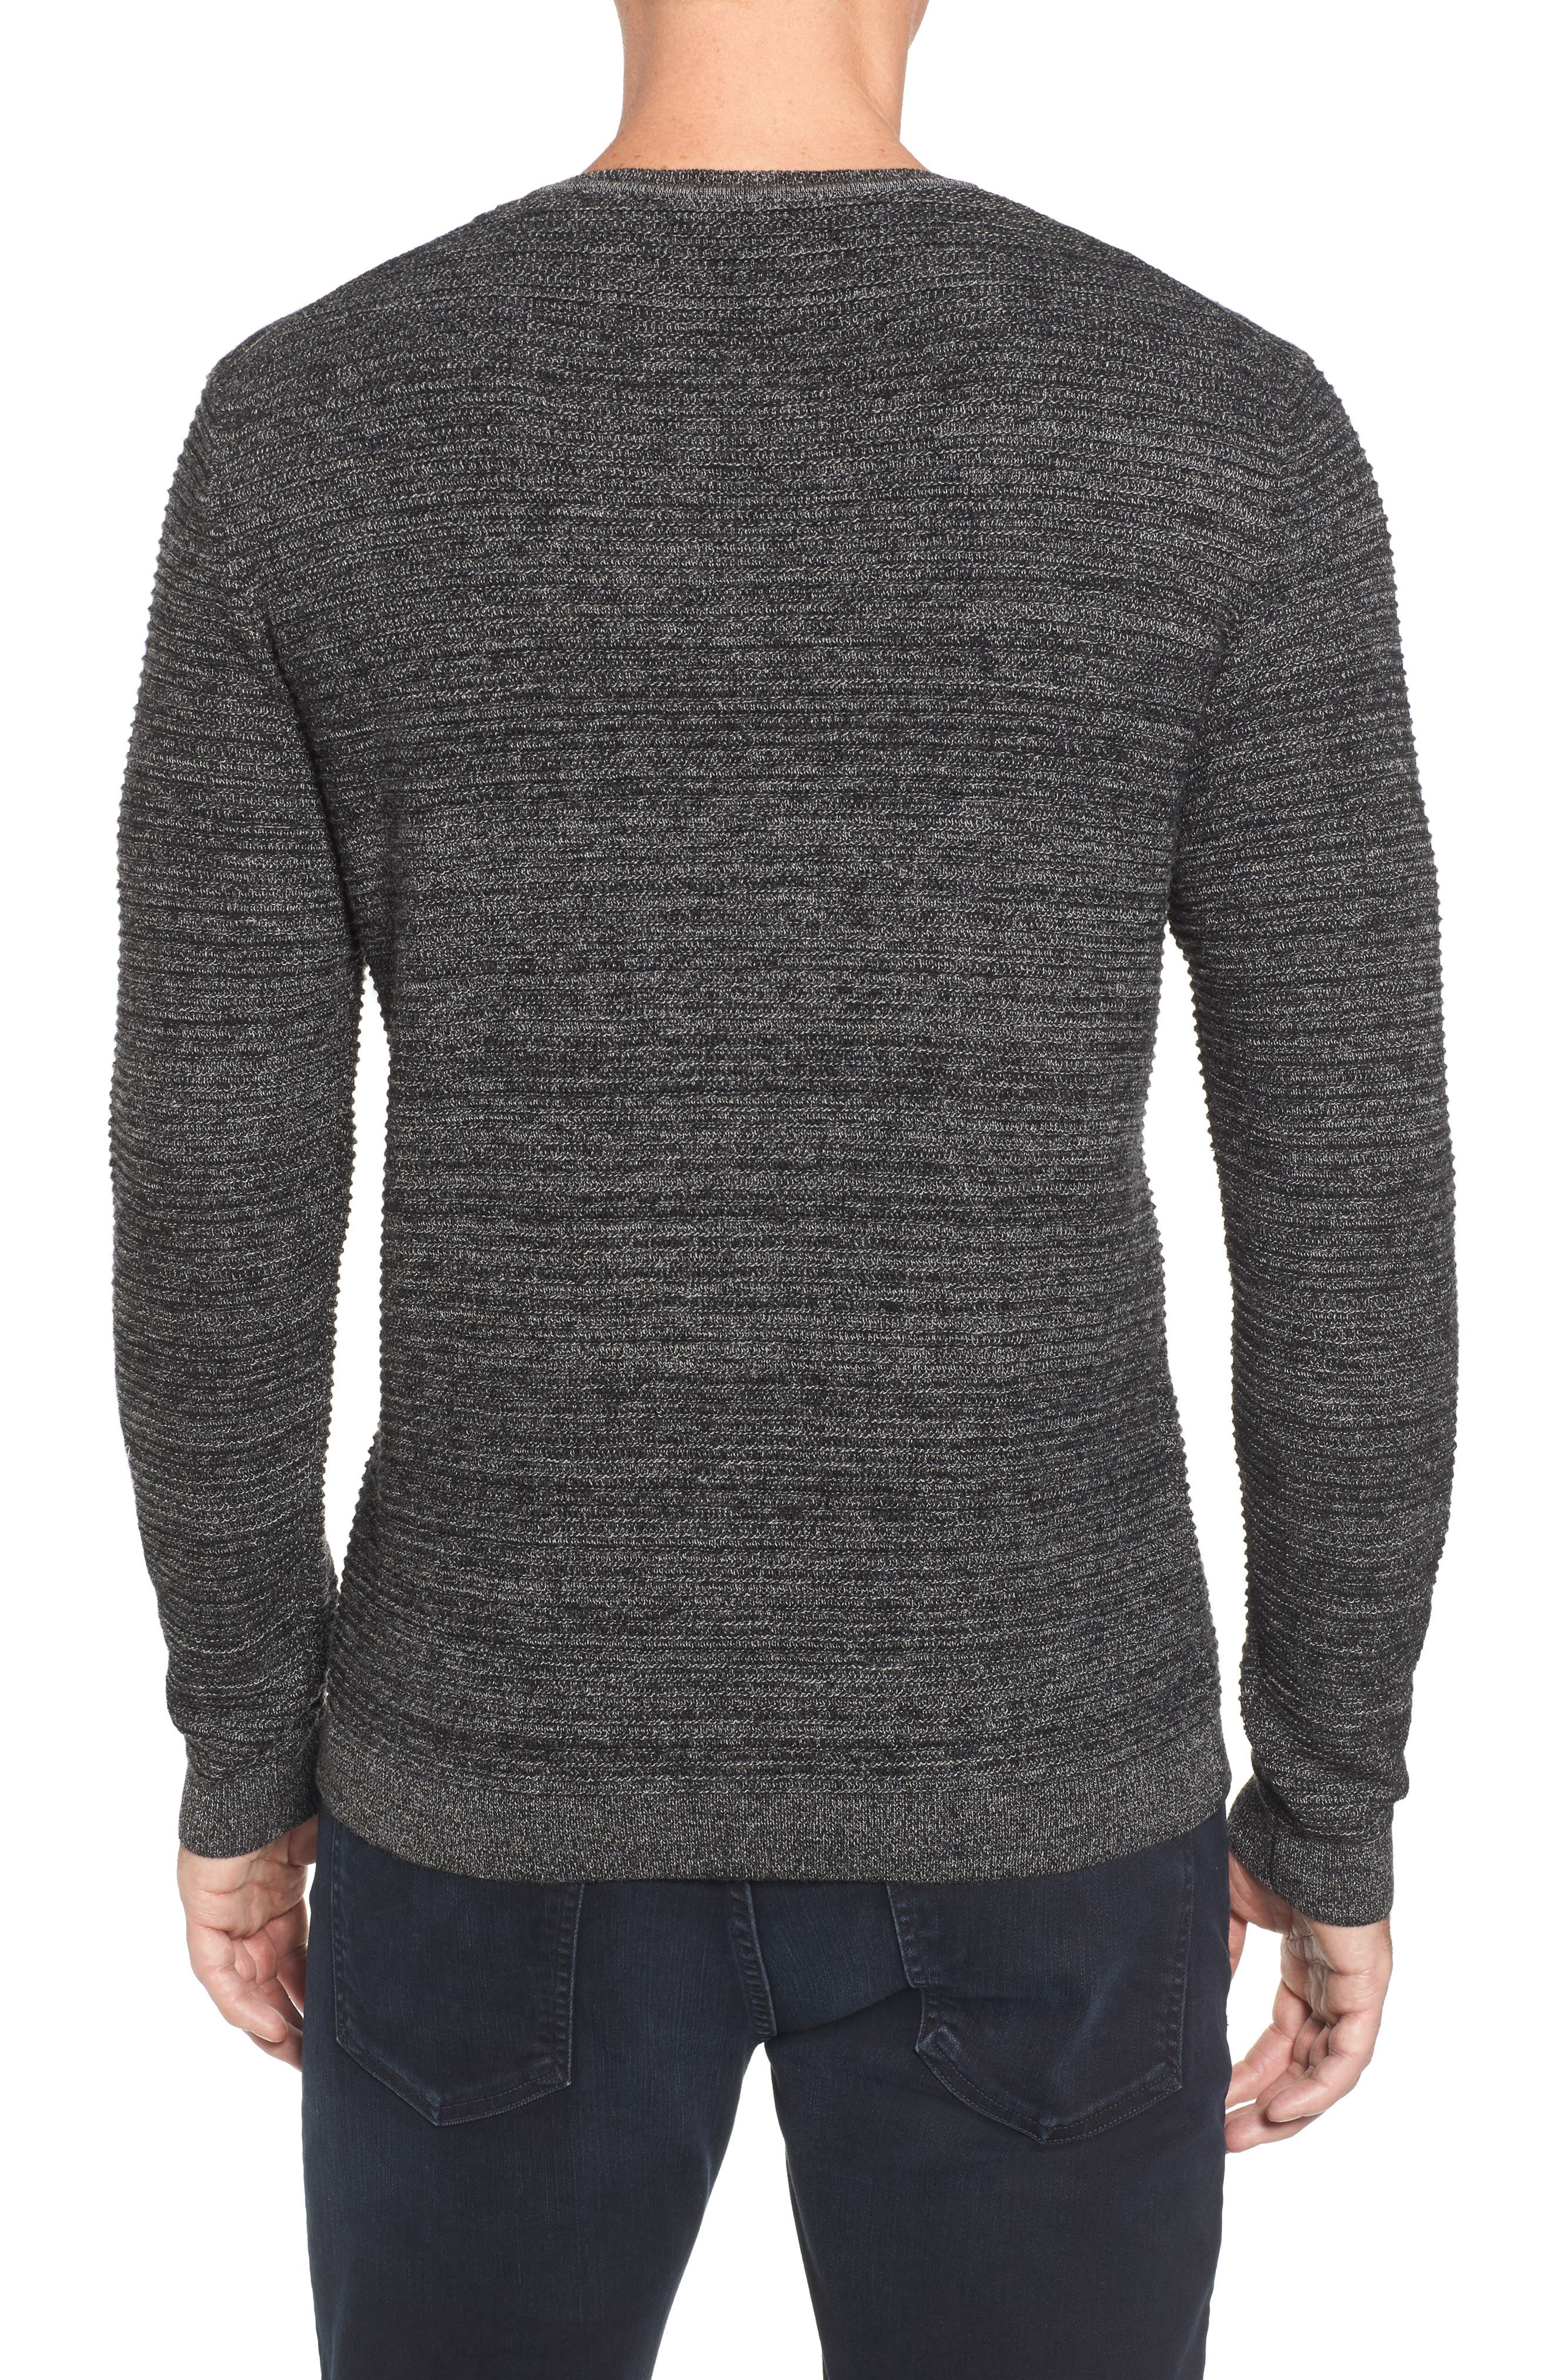 Ottoman Wool Blend Sweater,                             Alternate thumbnail 2, color,                             001